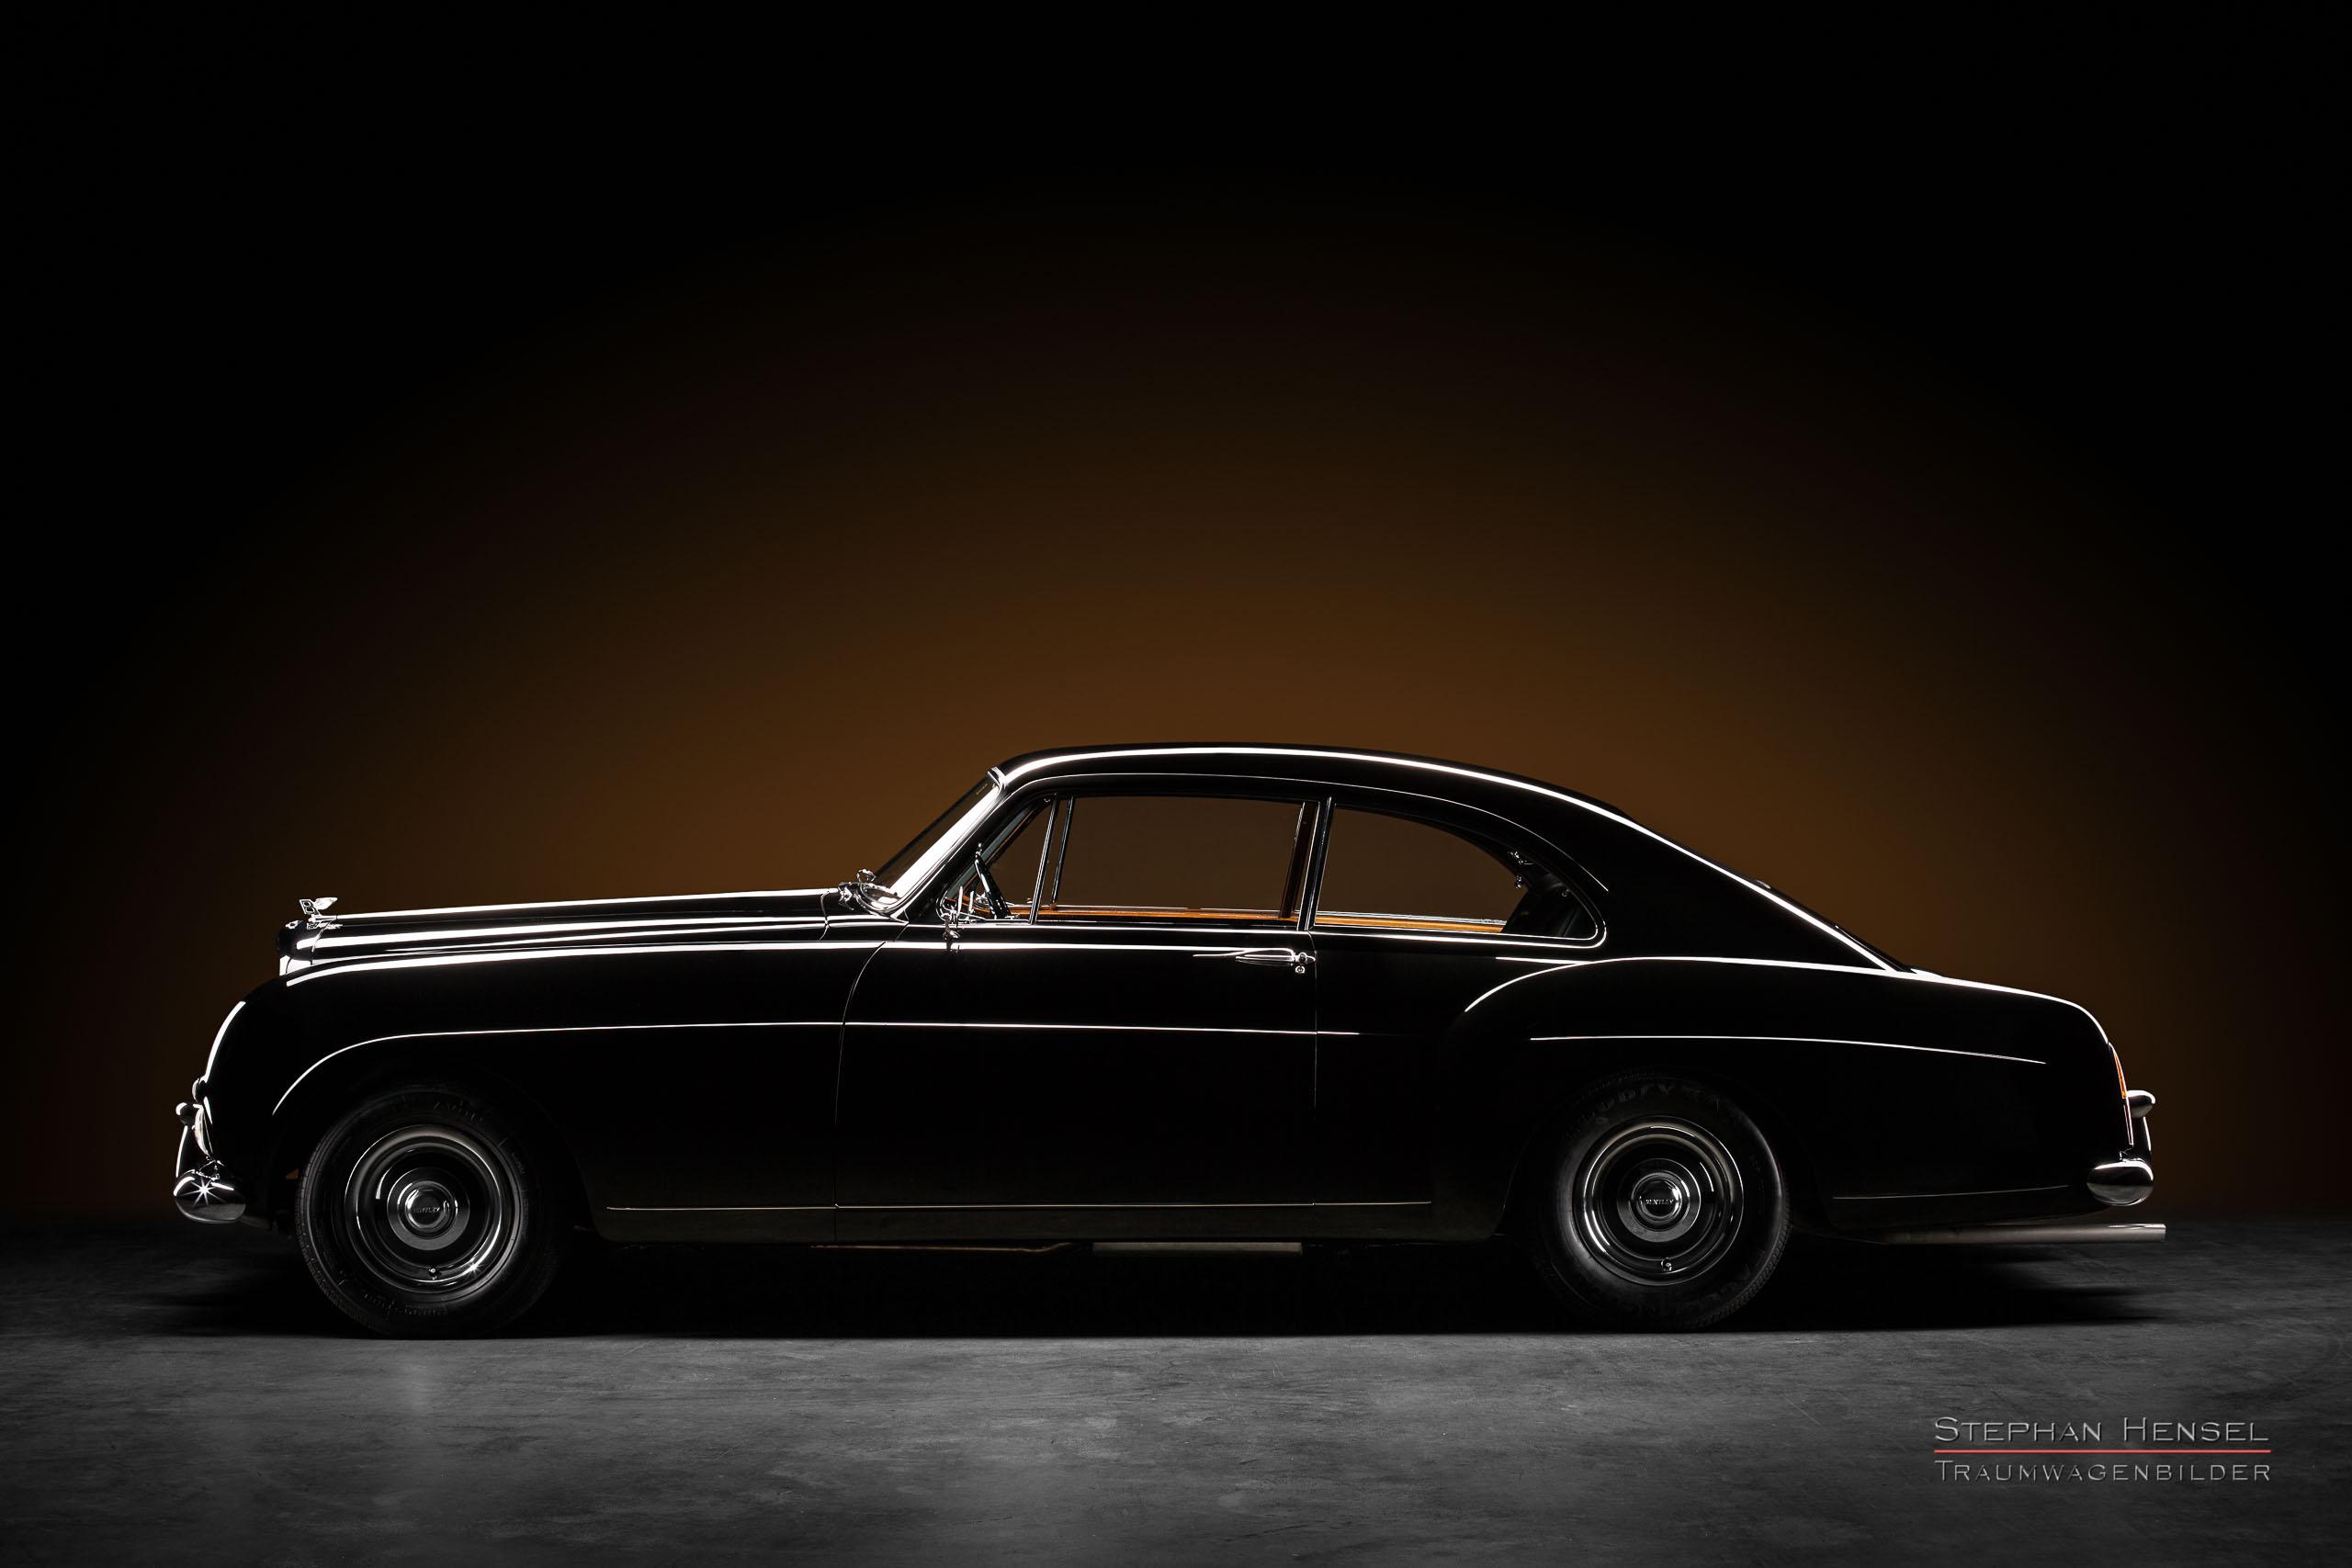 Bentley S1 Continental, 1956, Seitenansicht, Autofotograf, Hamburg, Automobilfotograf, Oldtimerfotograf, Oldtimerfotografie, Car Photography, Stephan Hensel